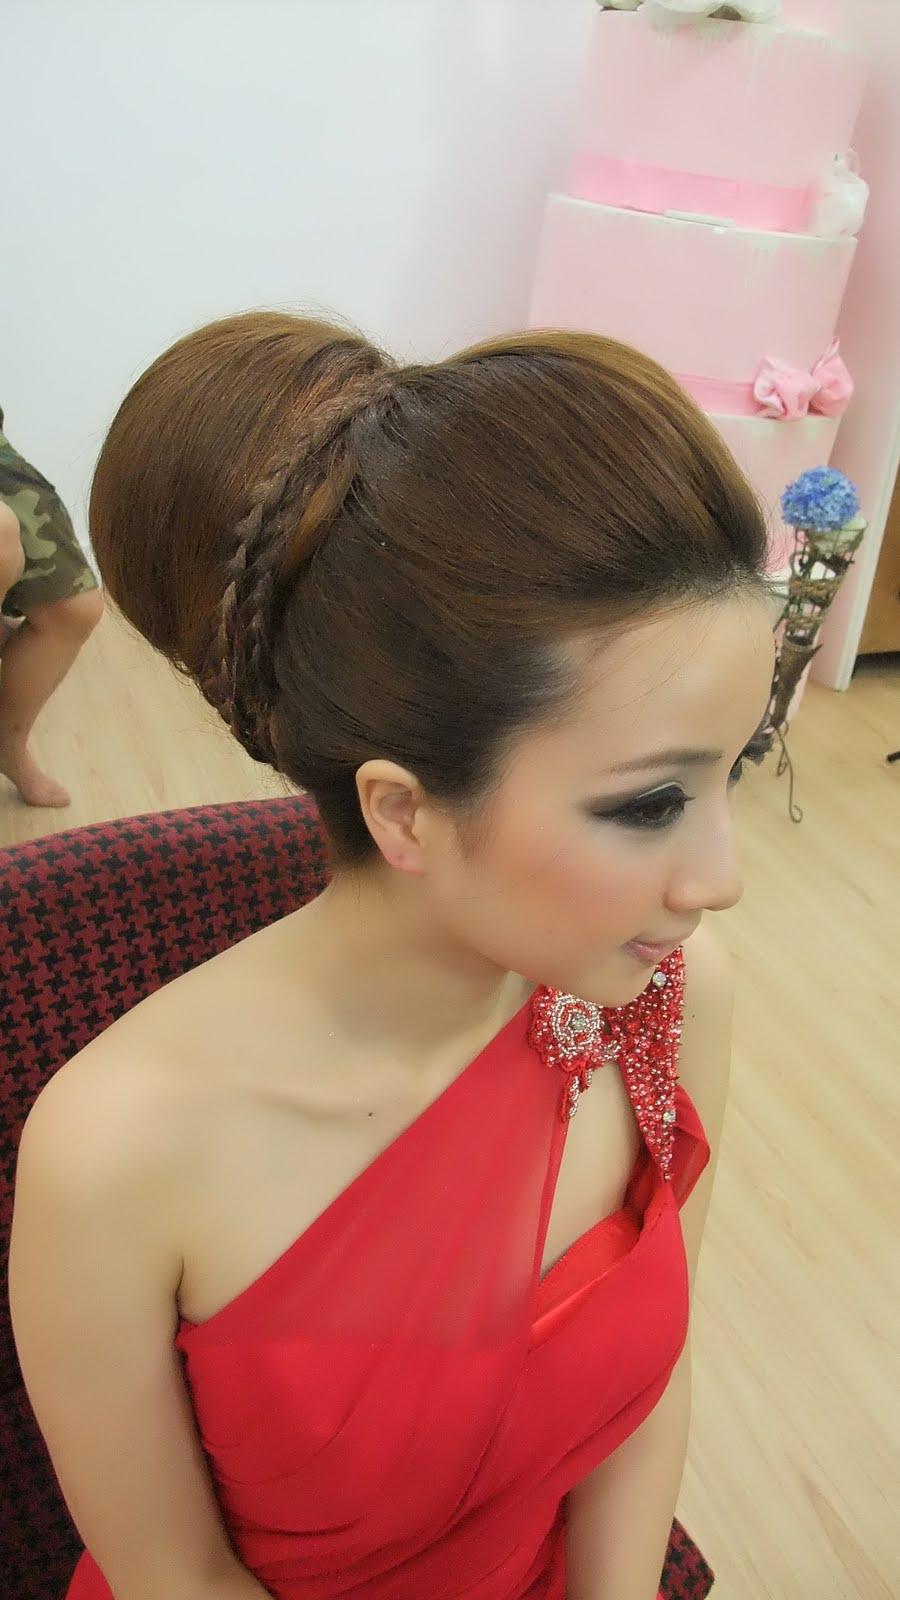 Grace Lin Makeup Professional Team: Grace Lin Professional Makeup Team: Make Up And Hair